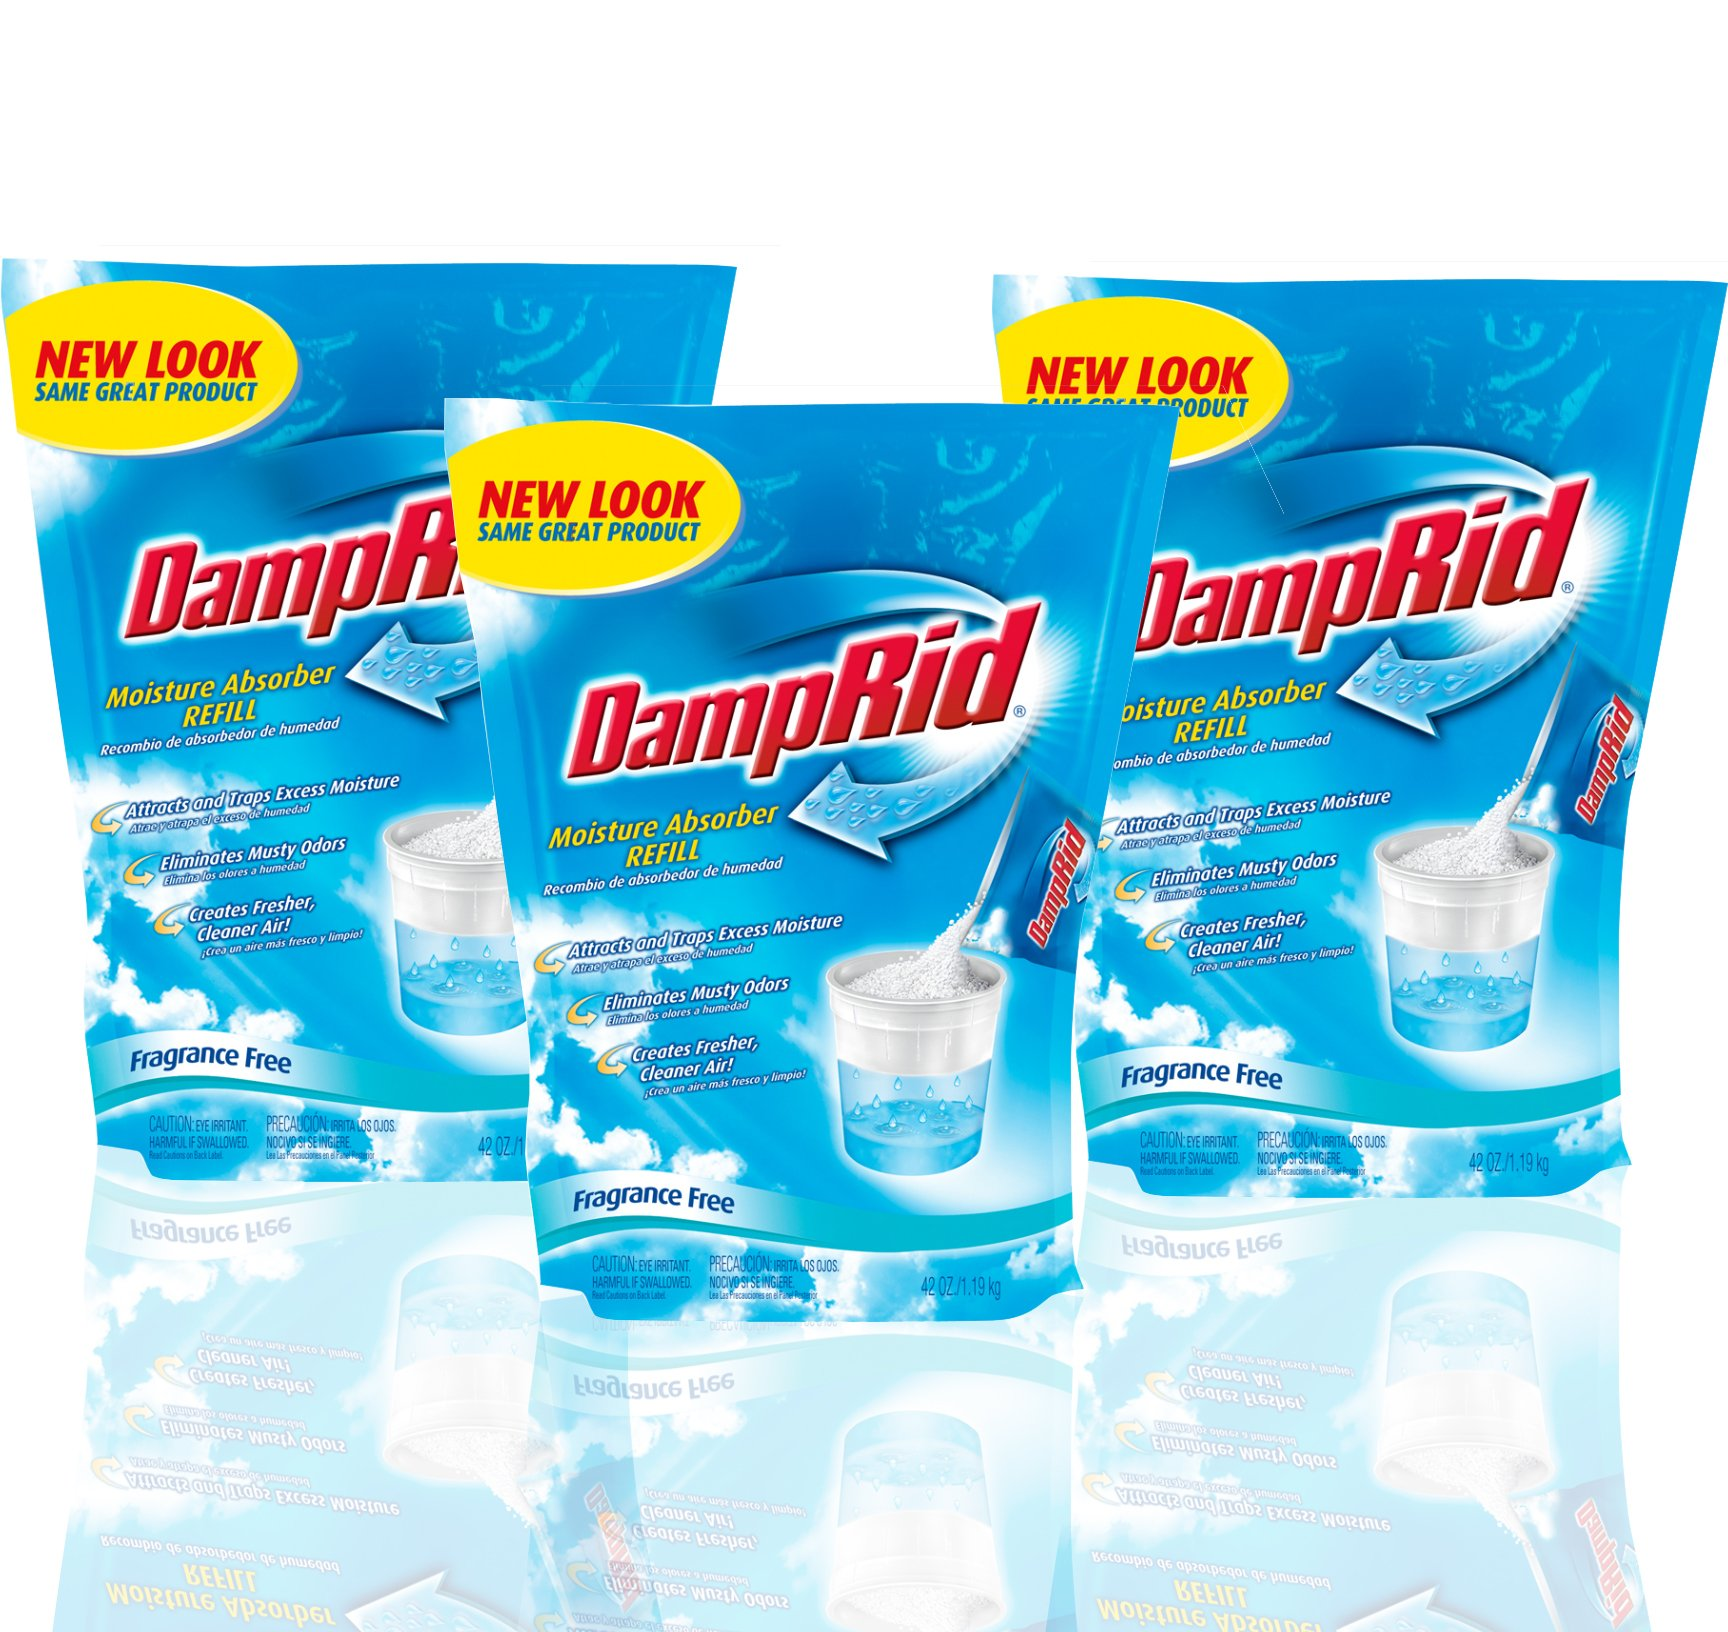 DampRid Moisture Absorber 42oz Refill Bag Fragrance Free (Pack of 3)